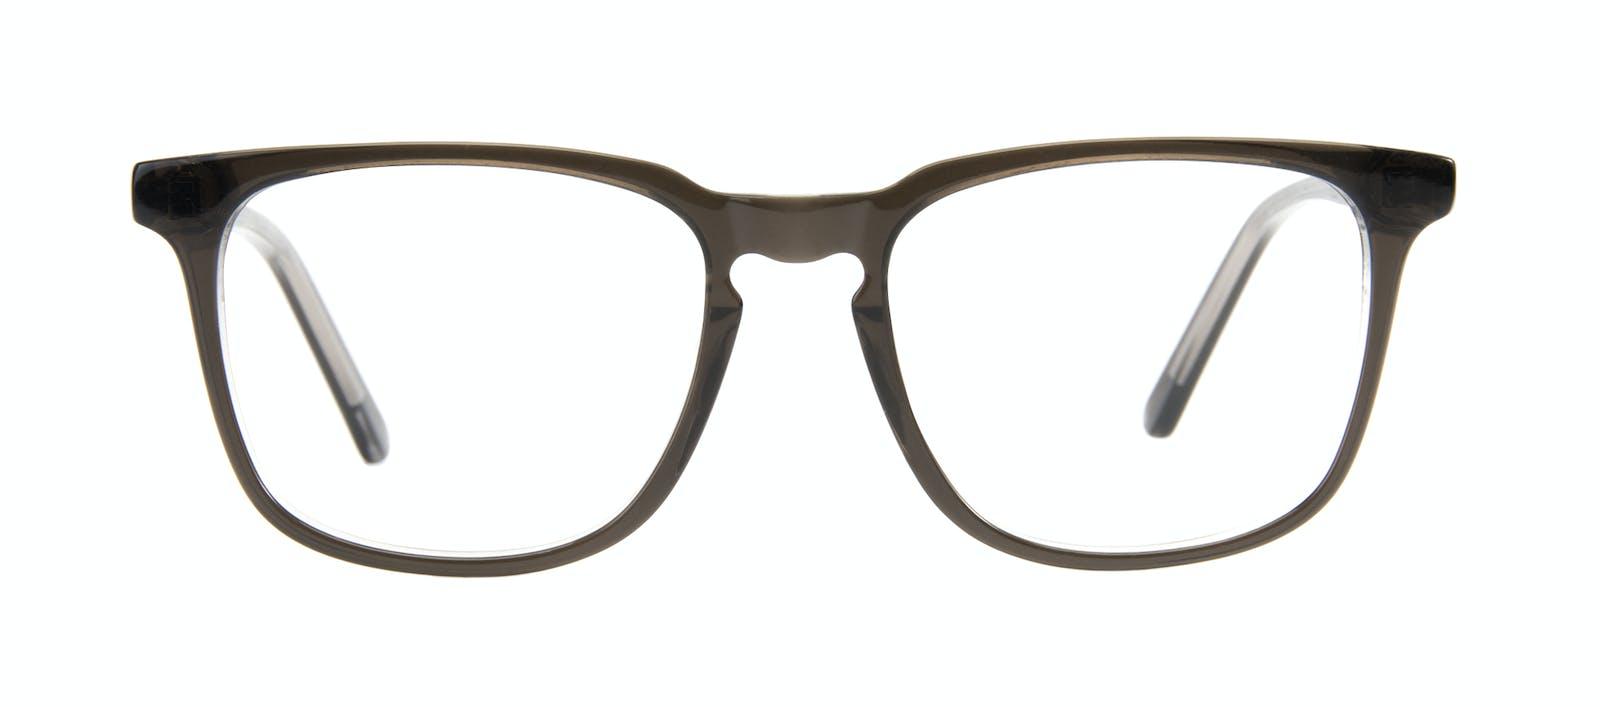 Men\'s Eyeglasses - Trace in Black Ice | BonLook